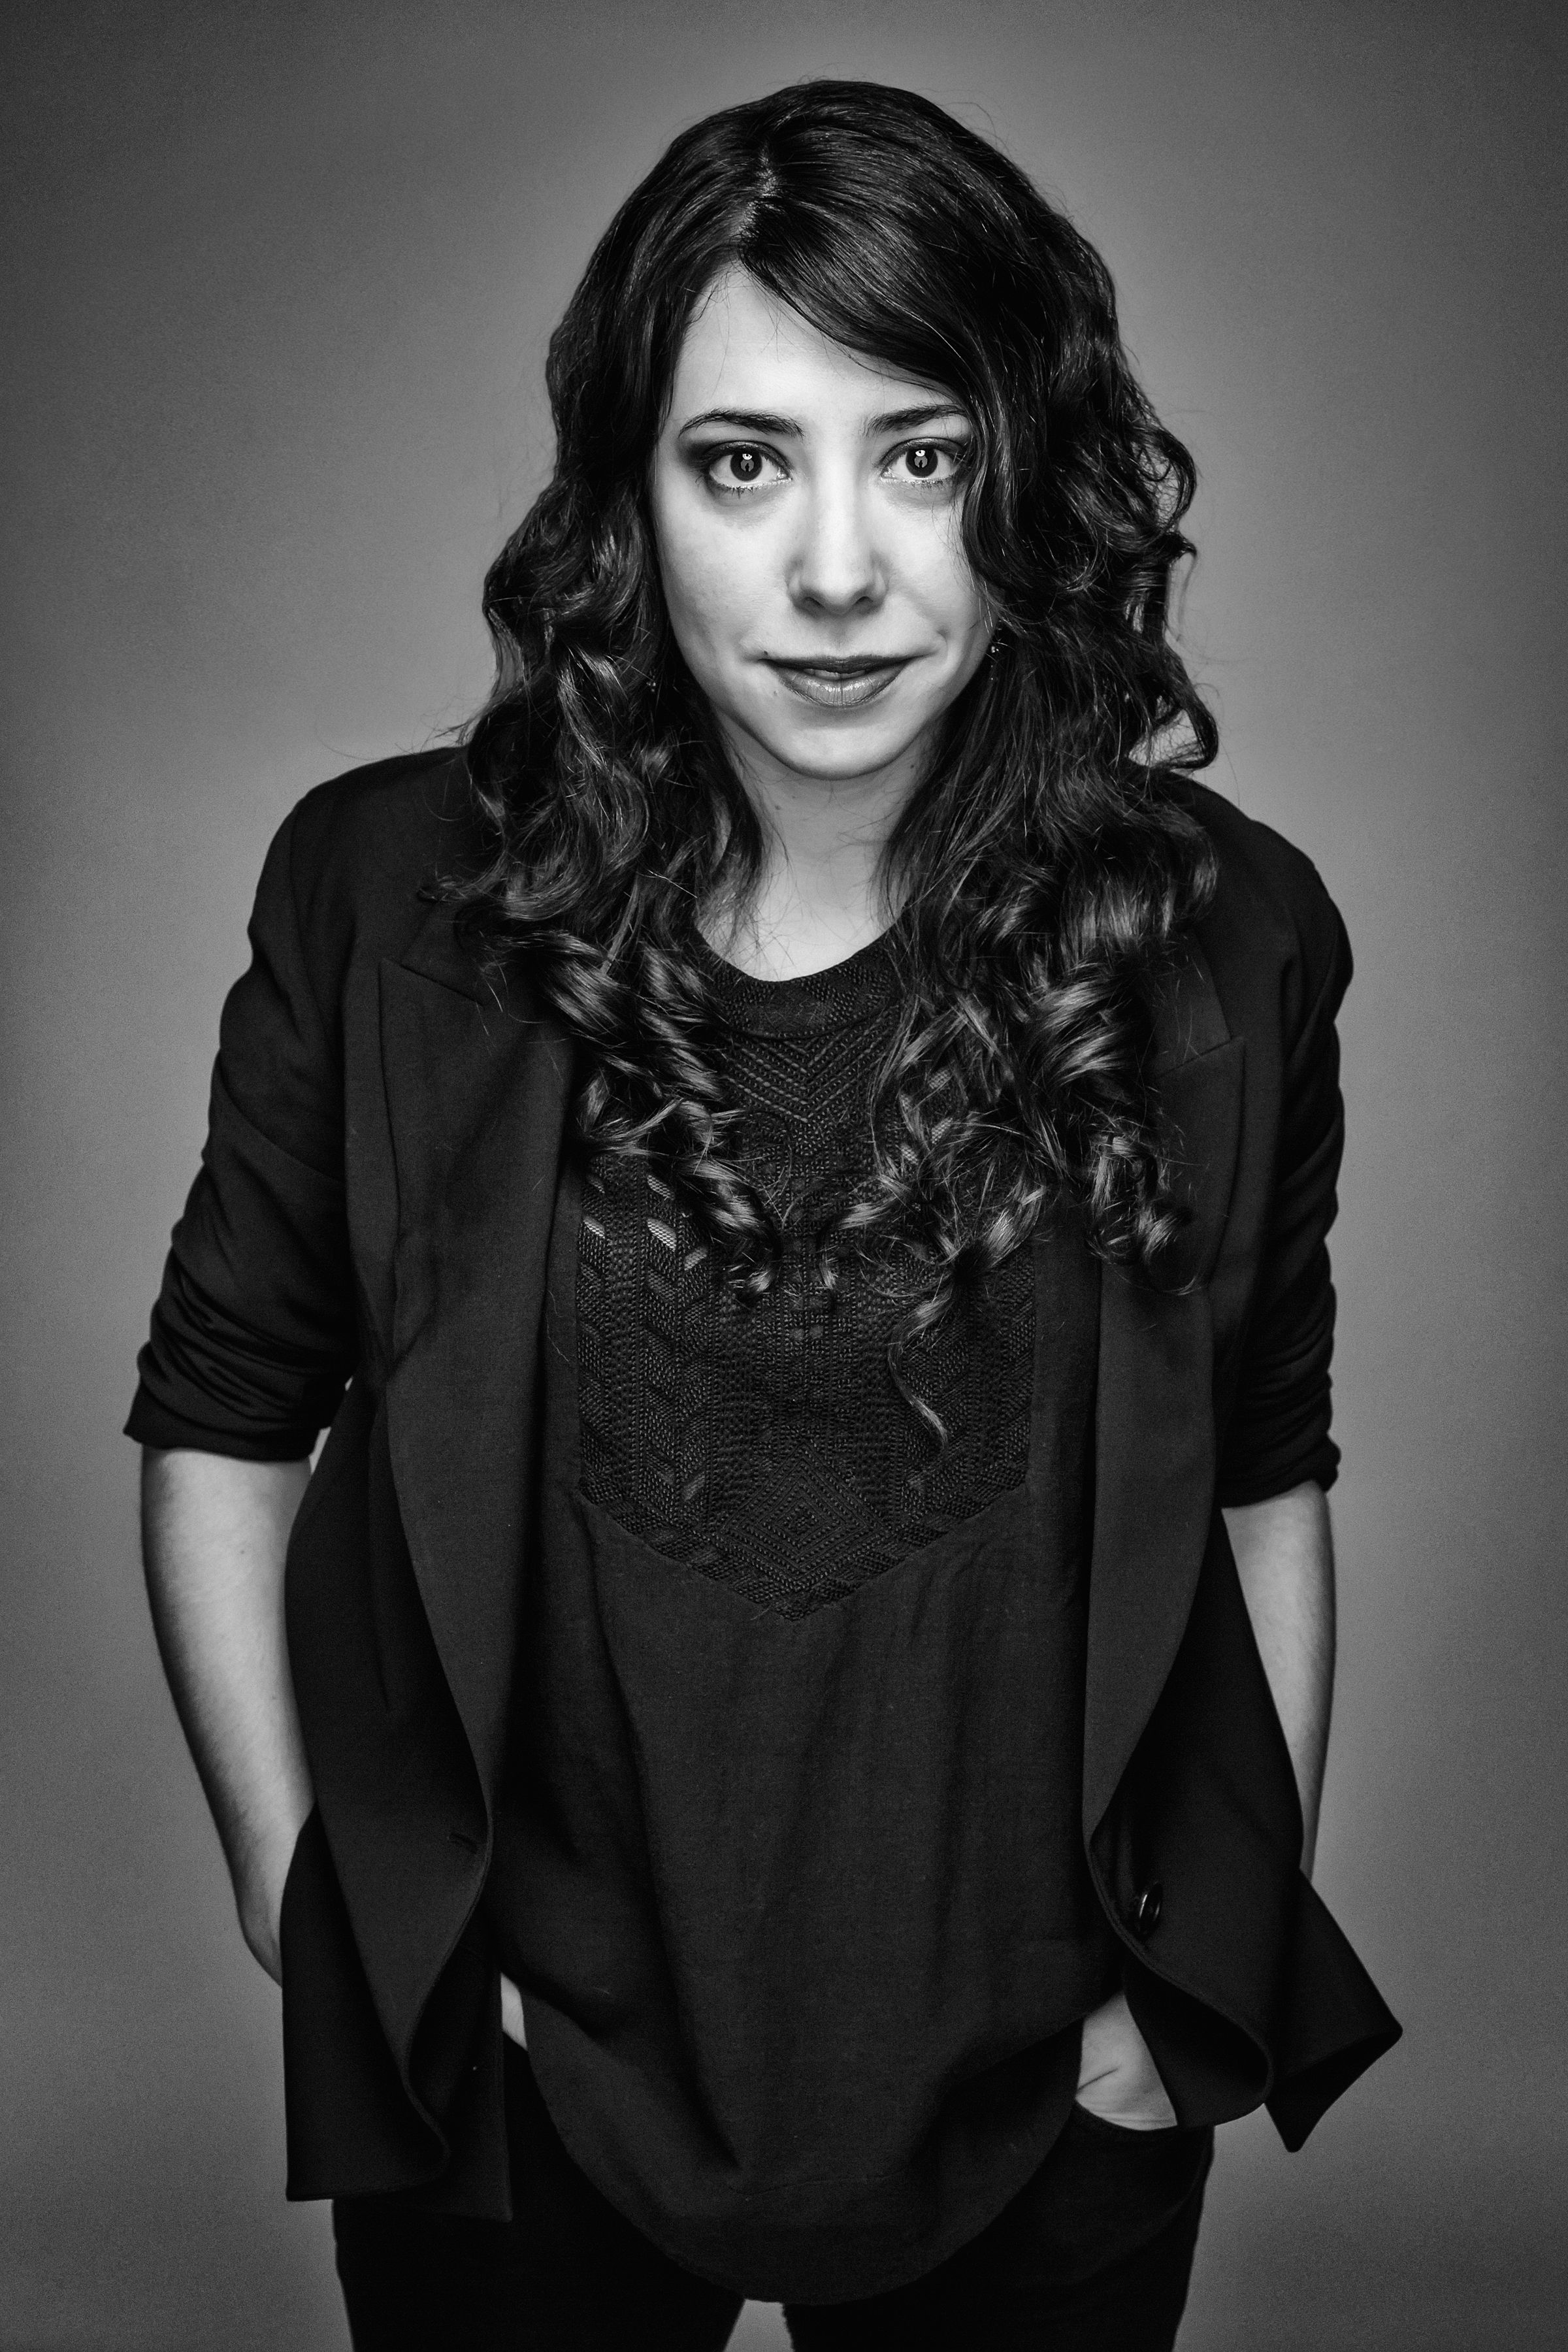 Hadestown Director Rachel Chavkin on the Story Behind Her Viral Tony Awards Speech